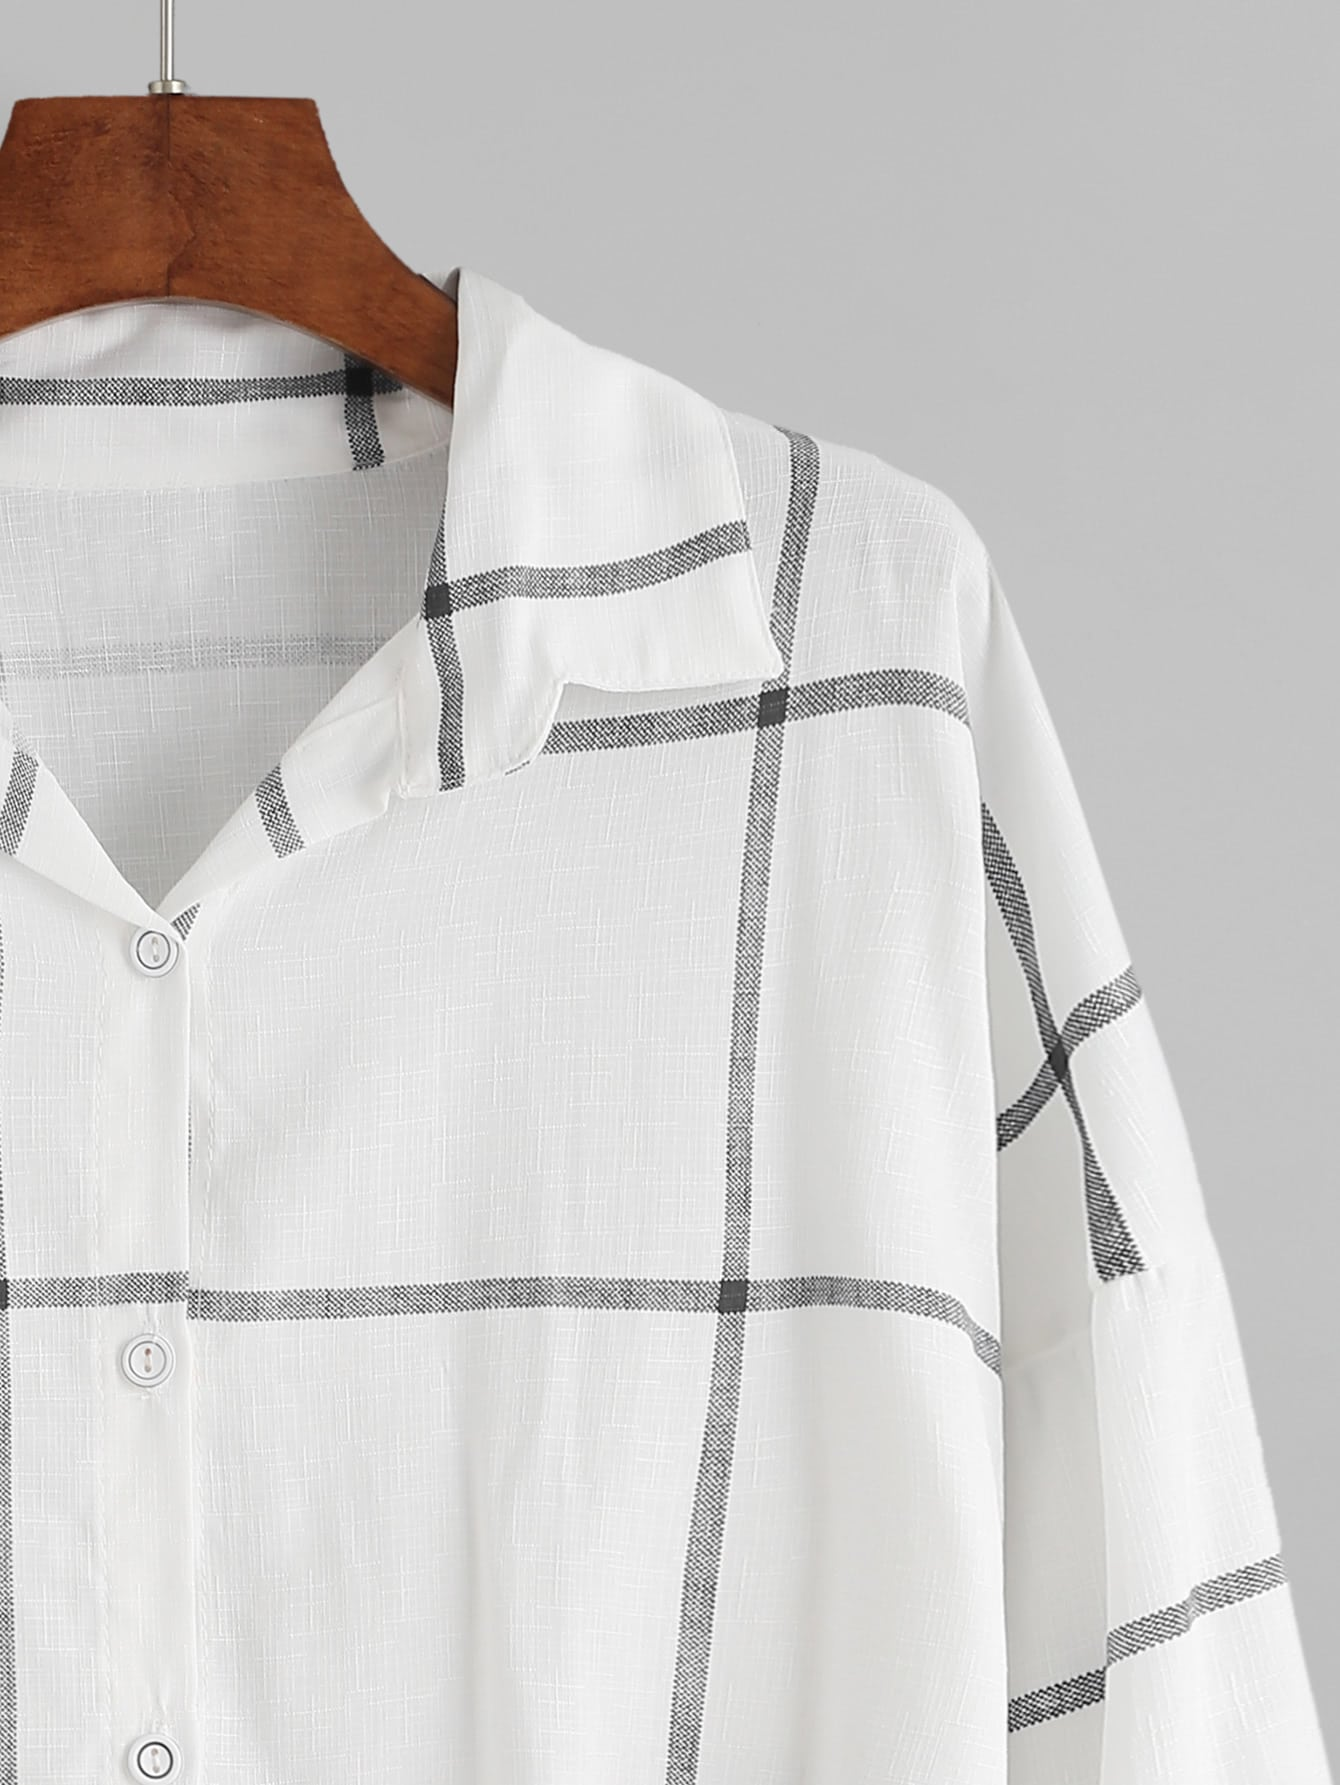 blouse160919105_2